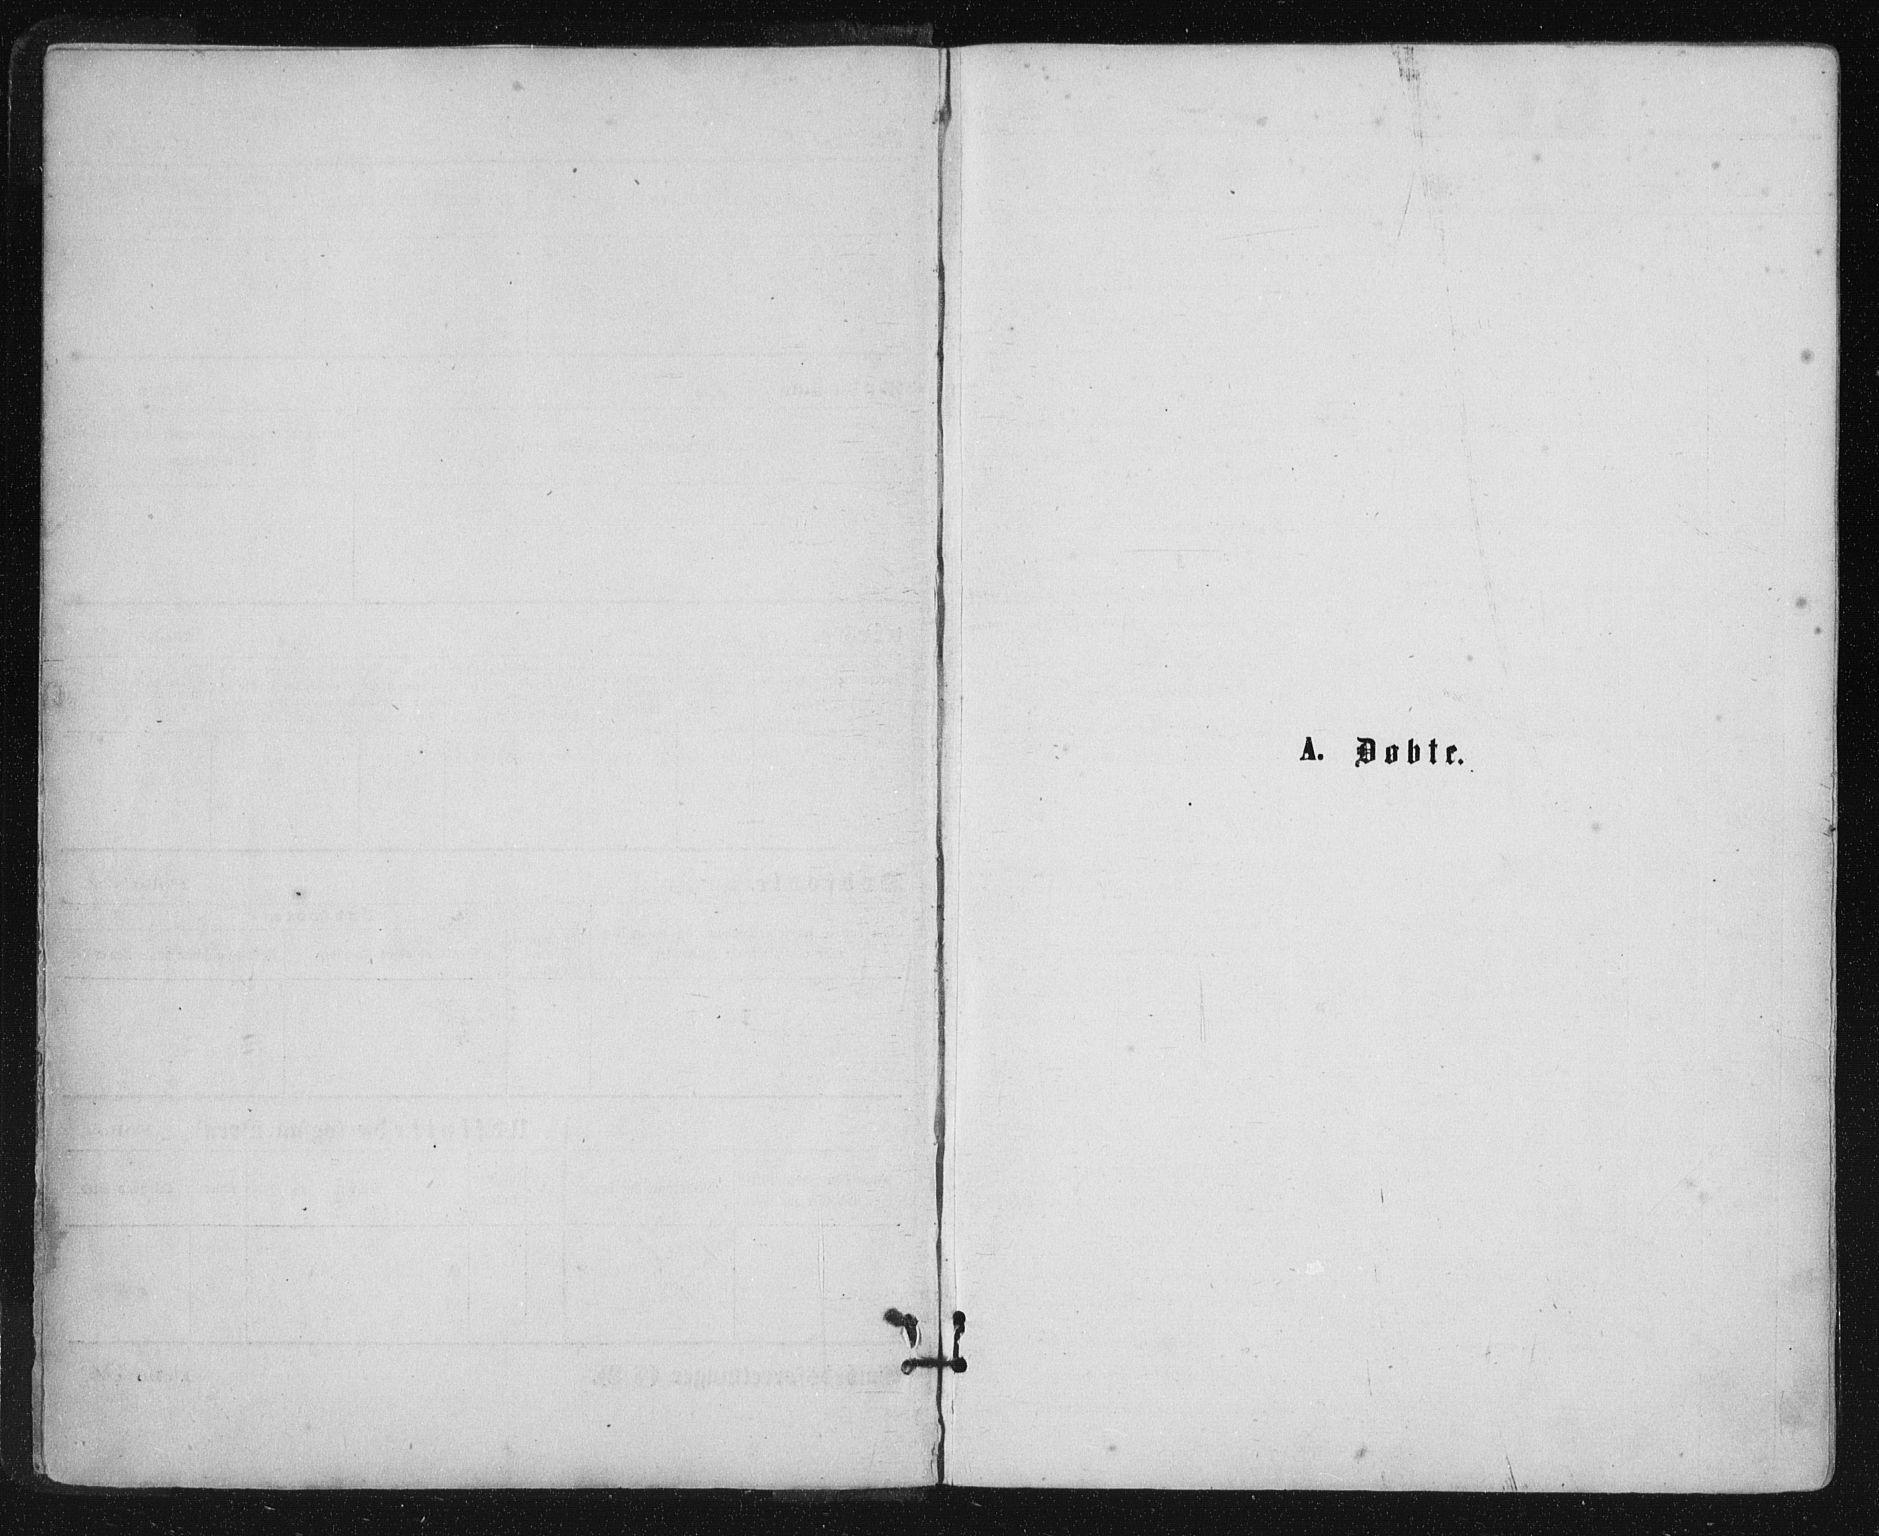 SAT, Ministerialprotokoller, klokkerbøker og fødselsregistre - Nordland, 816/L0241: Ministerialbok nr. 816A07, 1870-1885